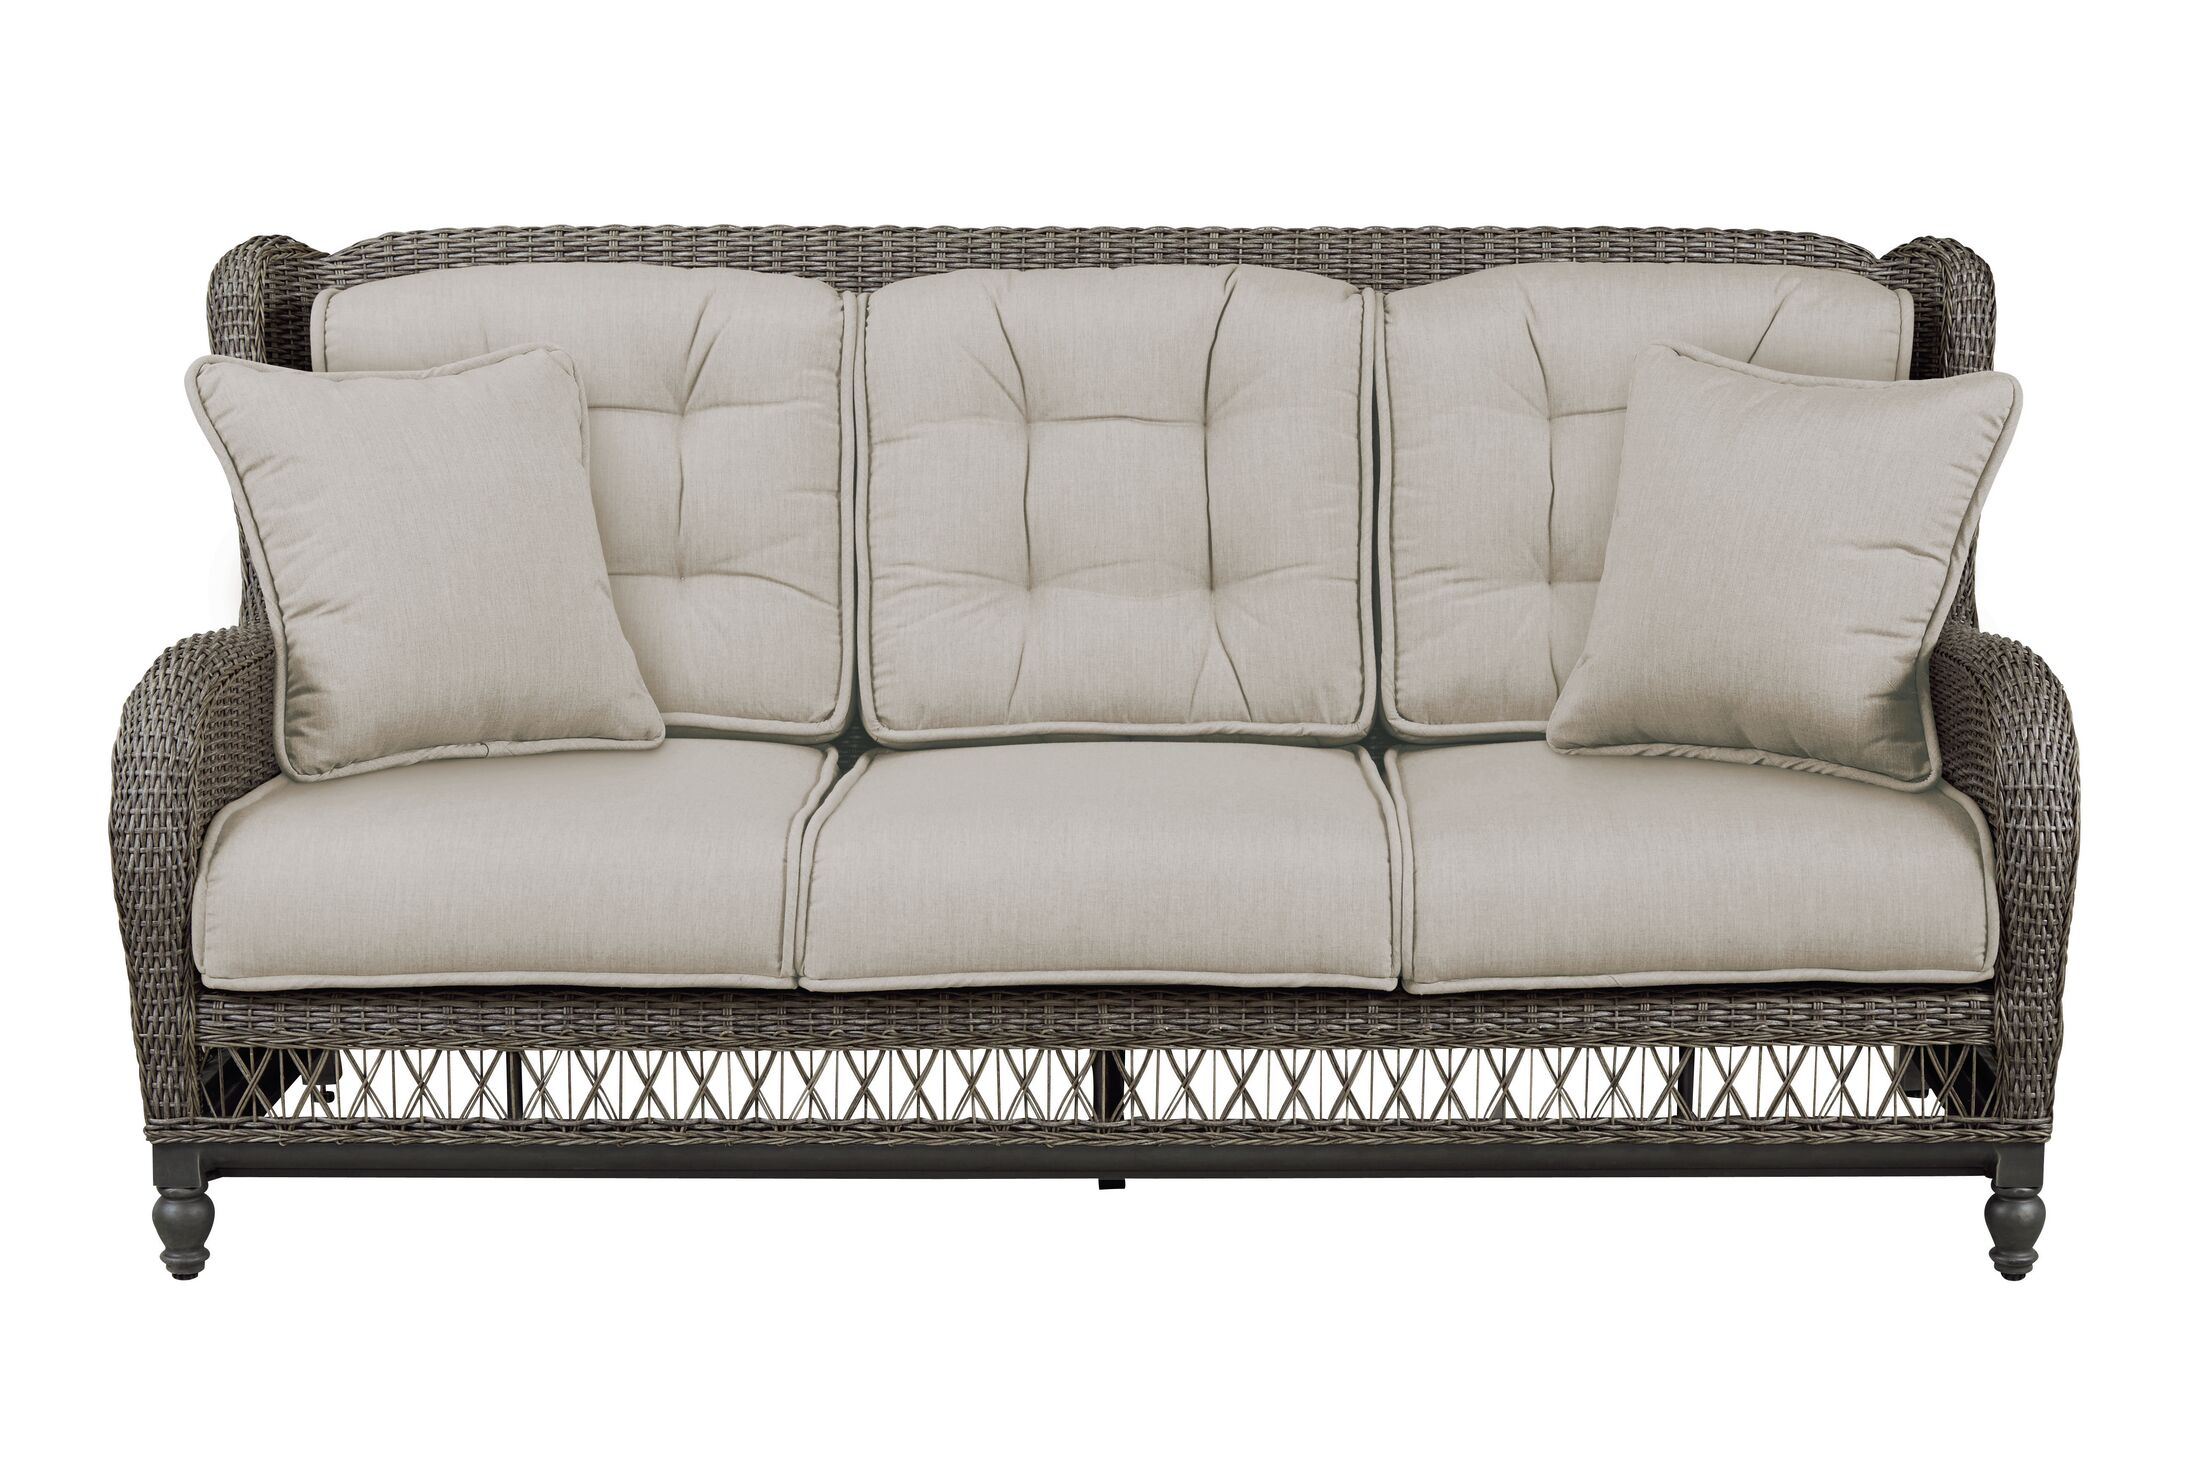 Dogwood Sofa with Cushions Fabric: Sailcloth Space